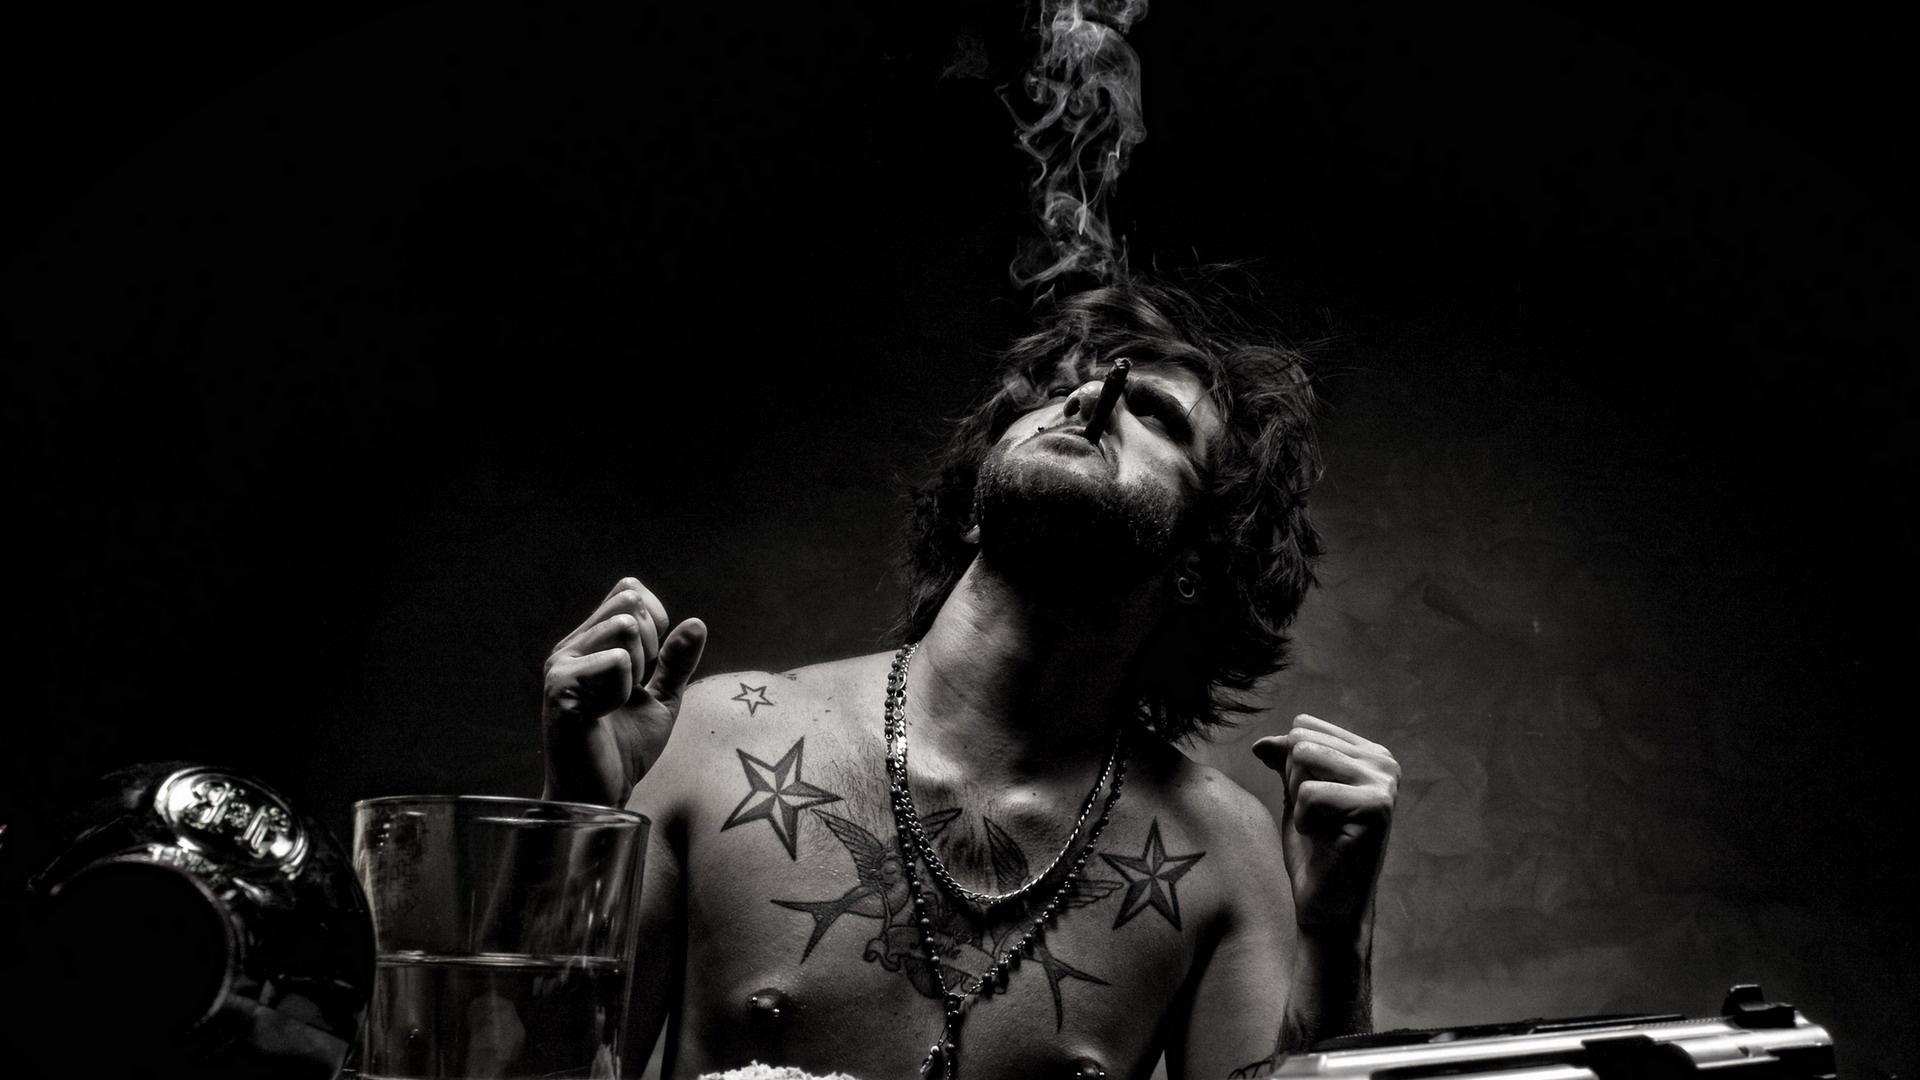 tatoo_man_cigar_smoking_tetovalt_srac_szivarozik_szivarom_blog_2.jpg